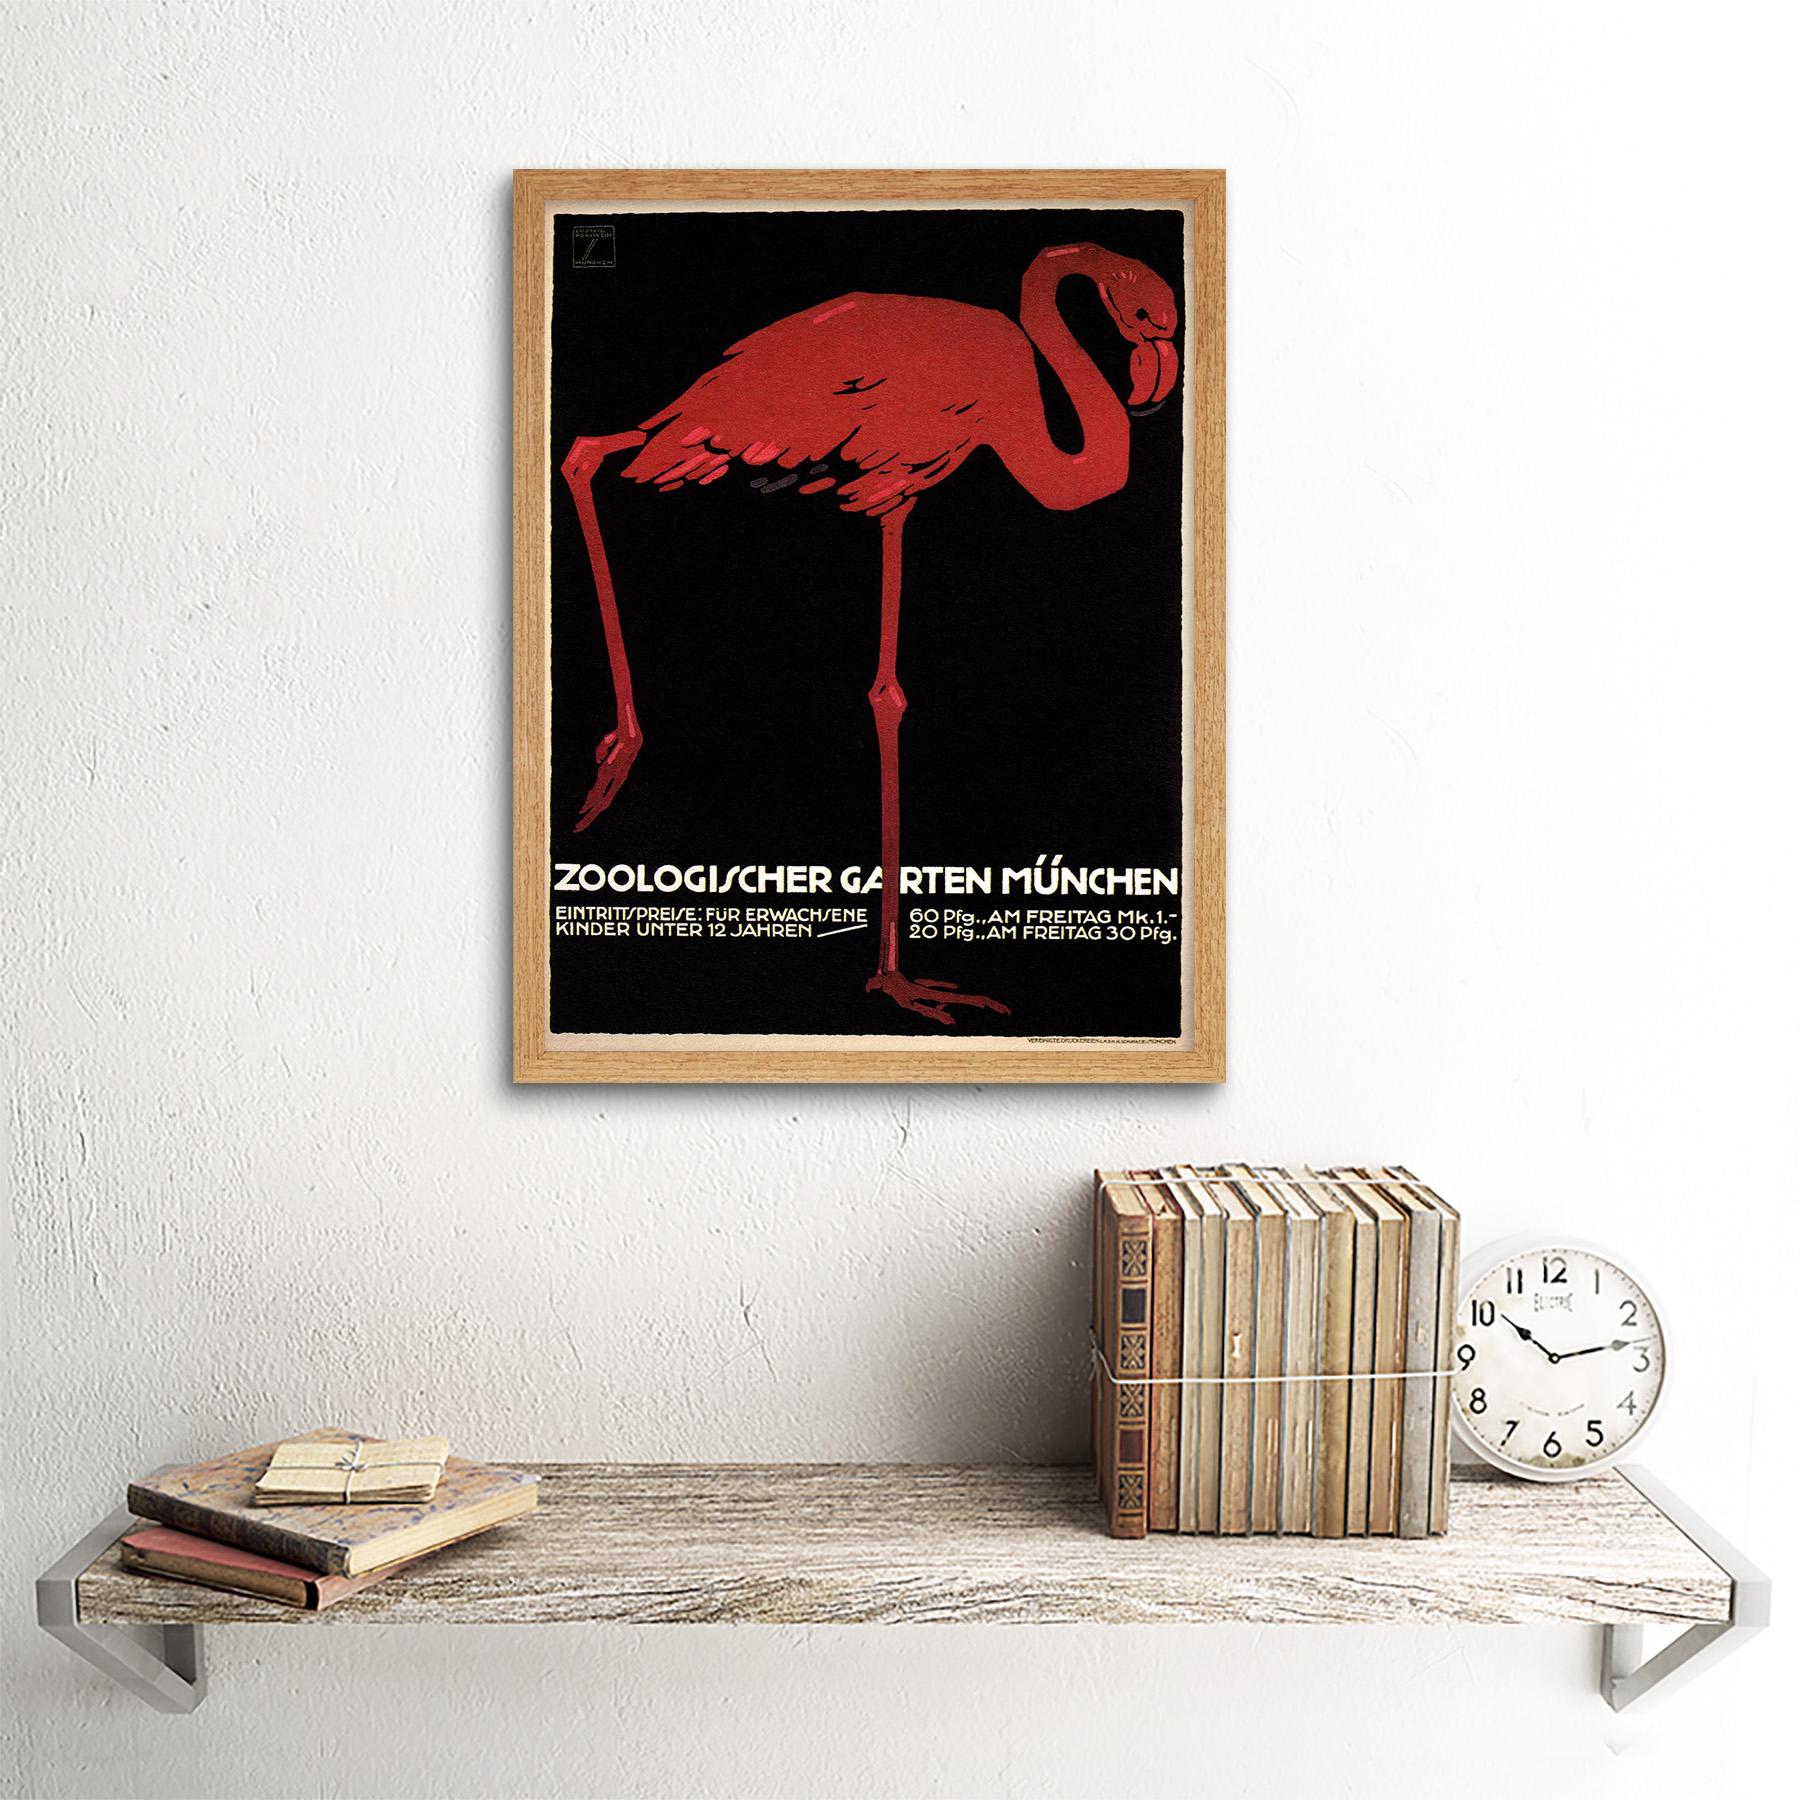 Cultural Zoo Flamingo Ave exposición de Múnich Baviera Alemania animal enmarcado impresión